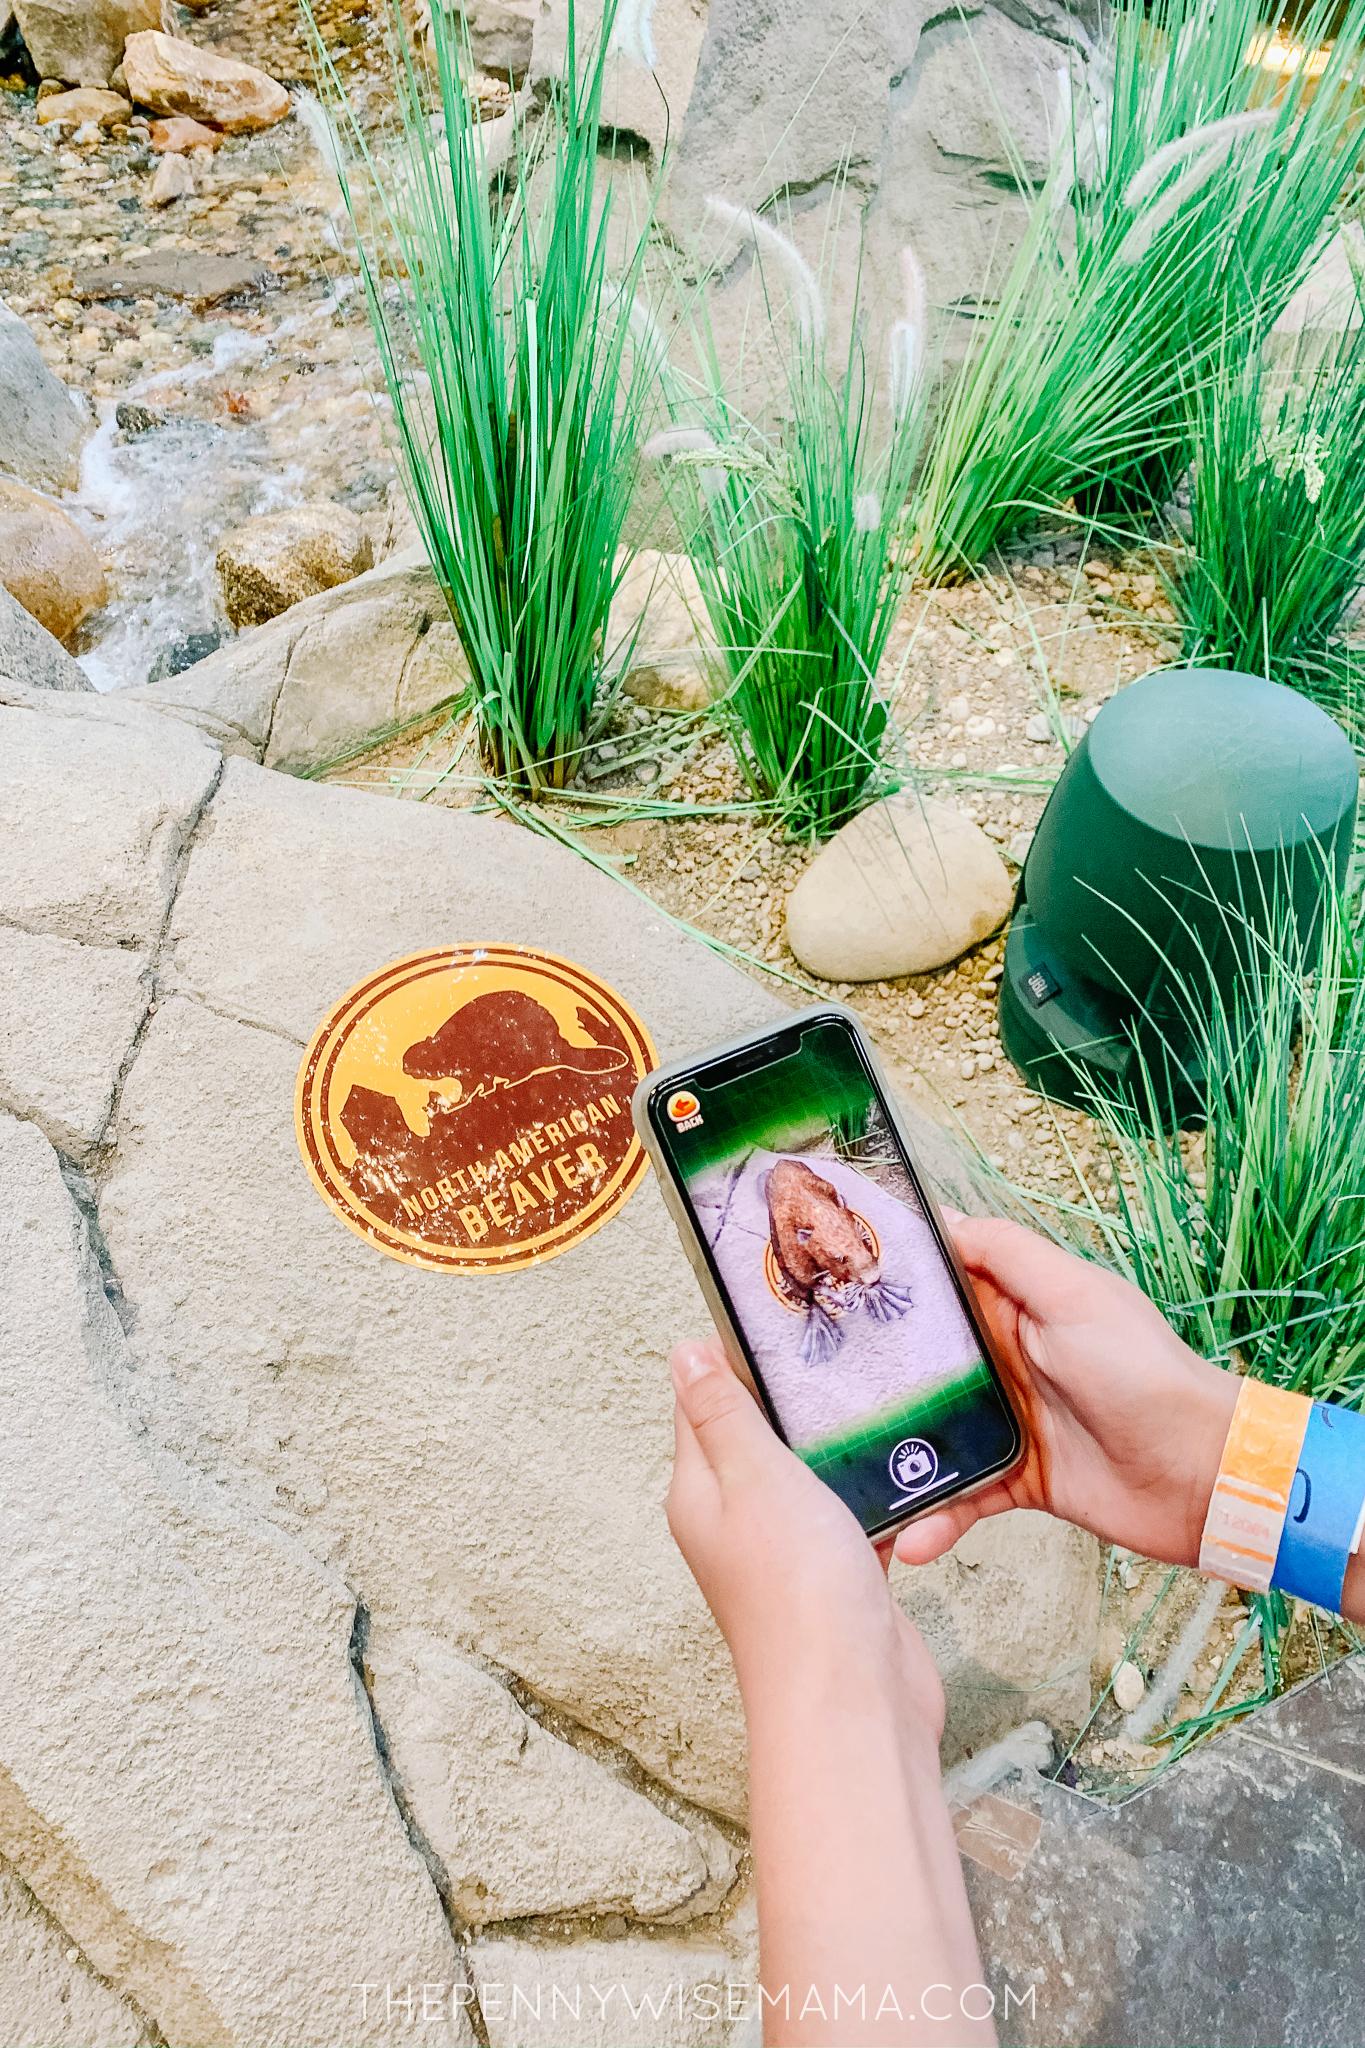 VR Scavenger Hunt at Gaylord Rockies